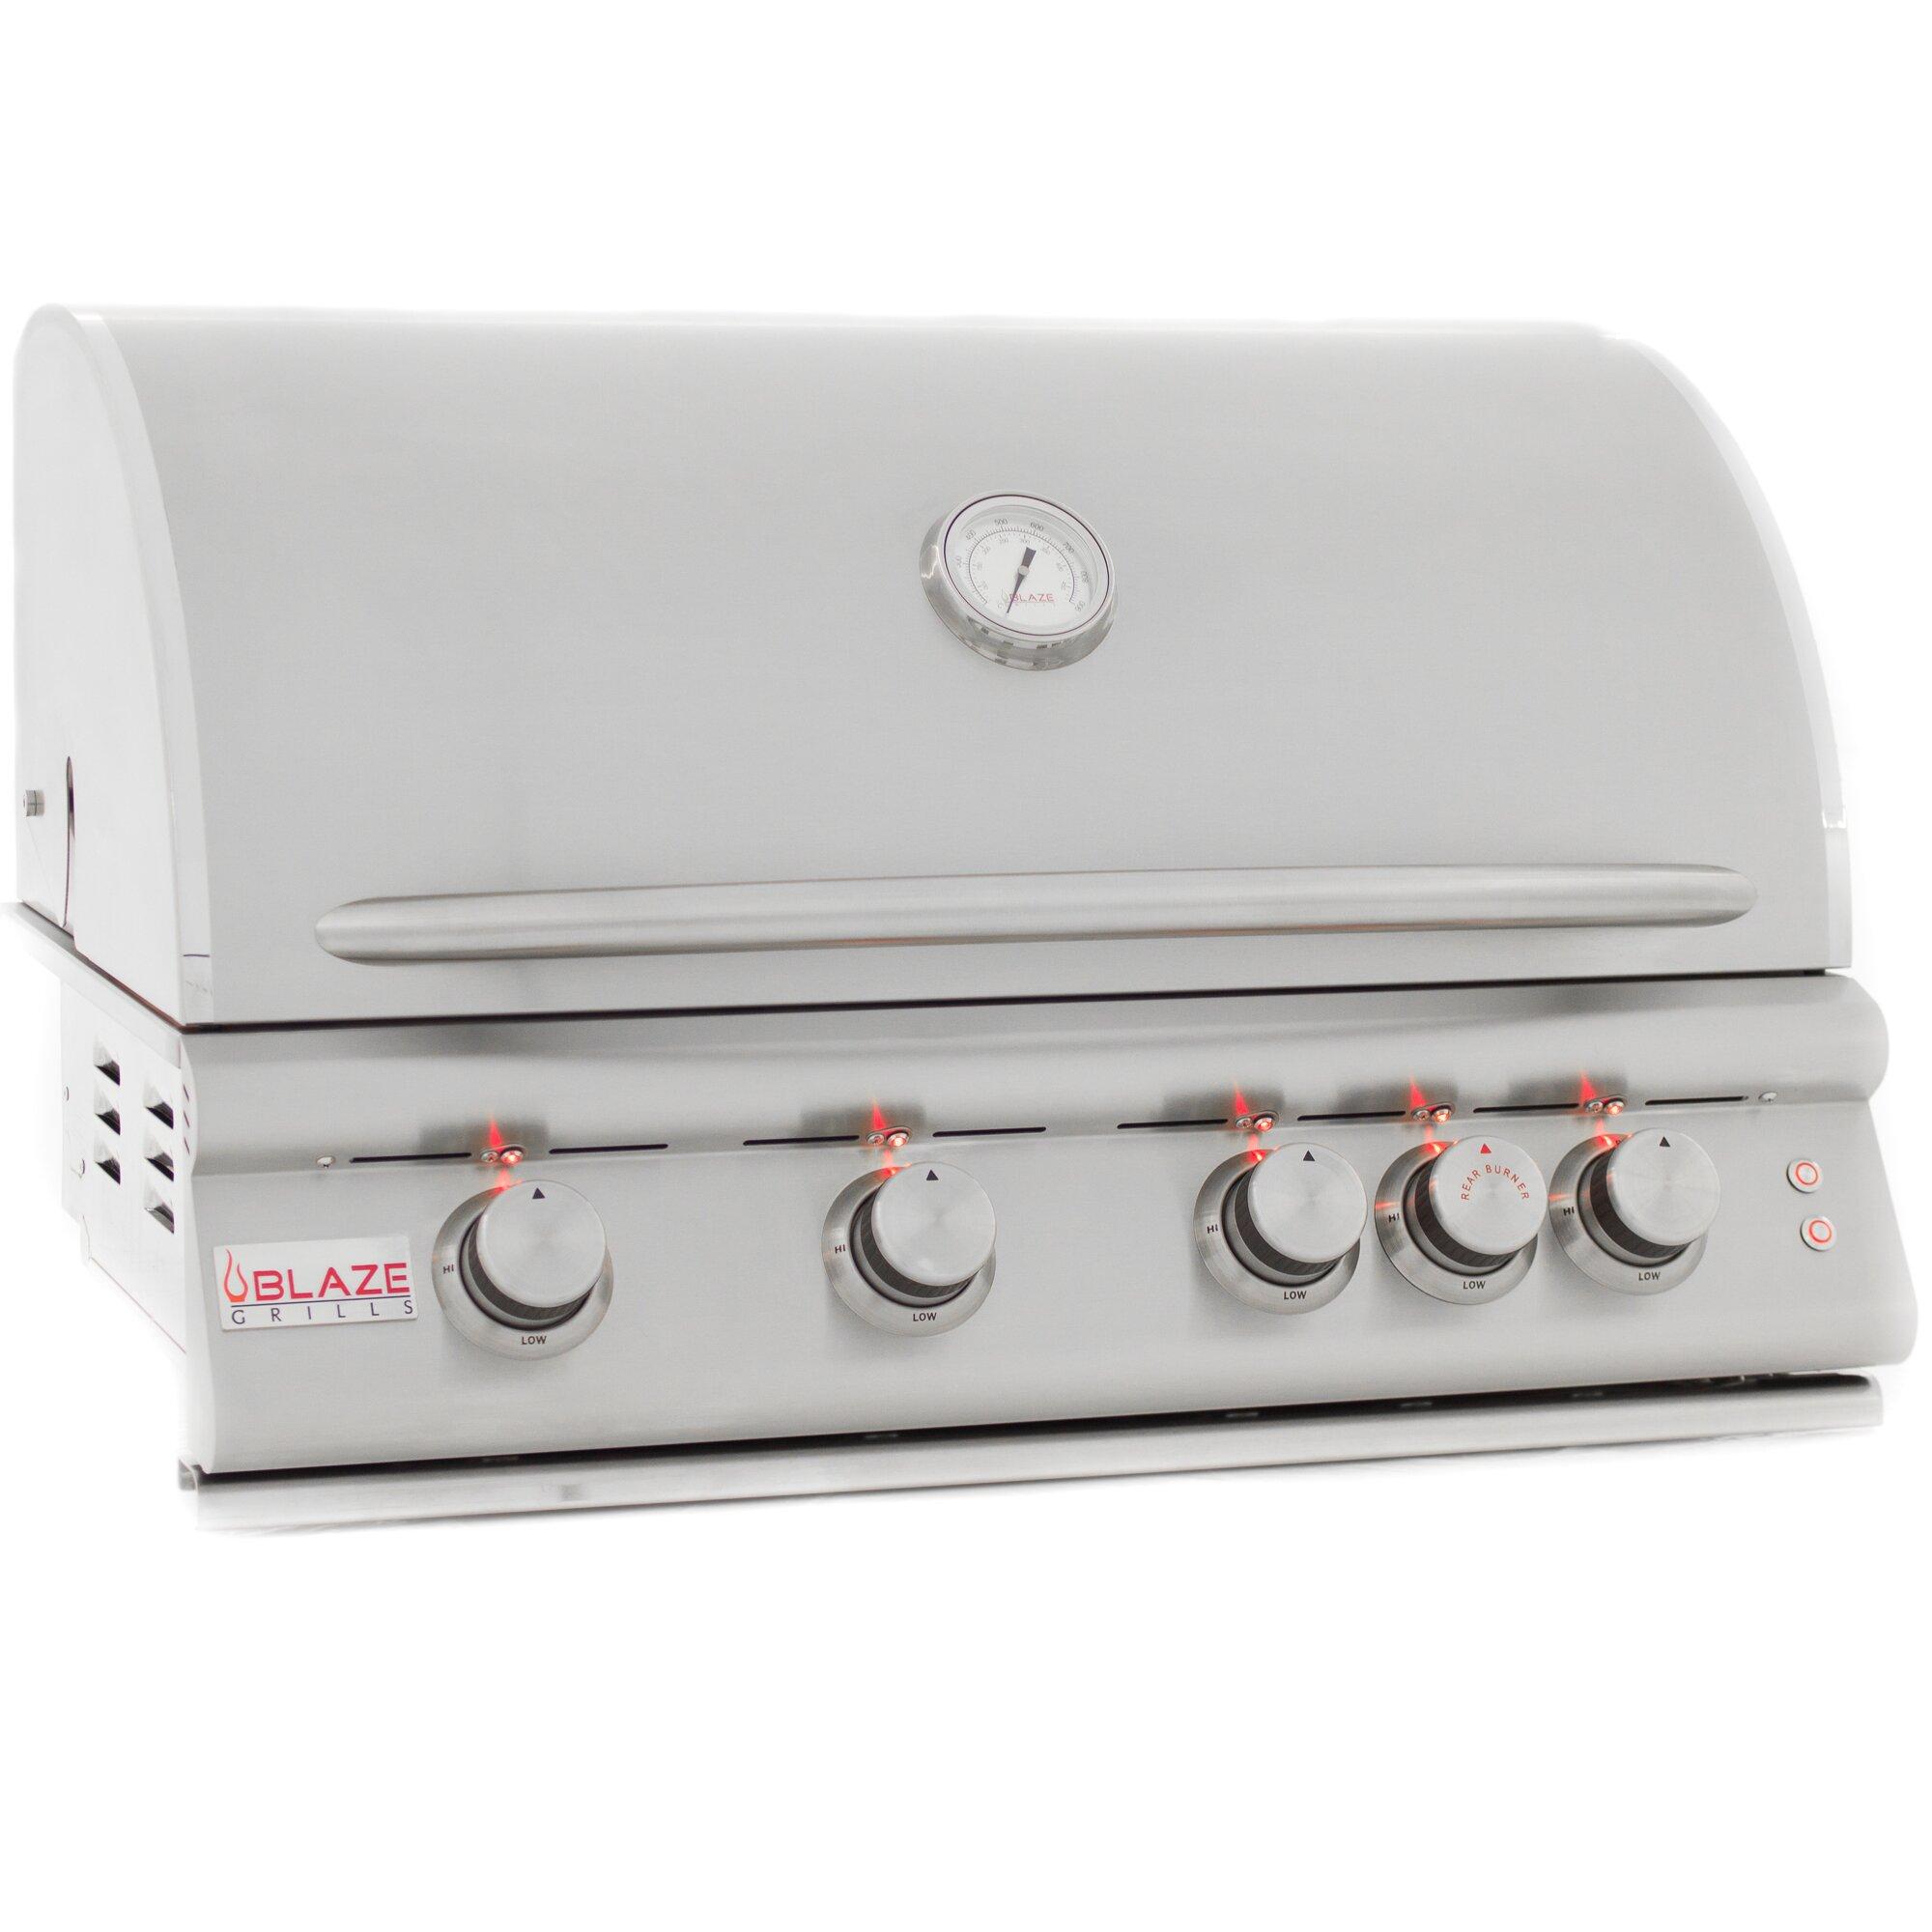 Blaze Grills LTE 4-Burner Built-In Propane Gas Grill | Wayfair